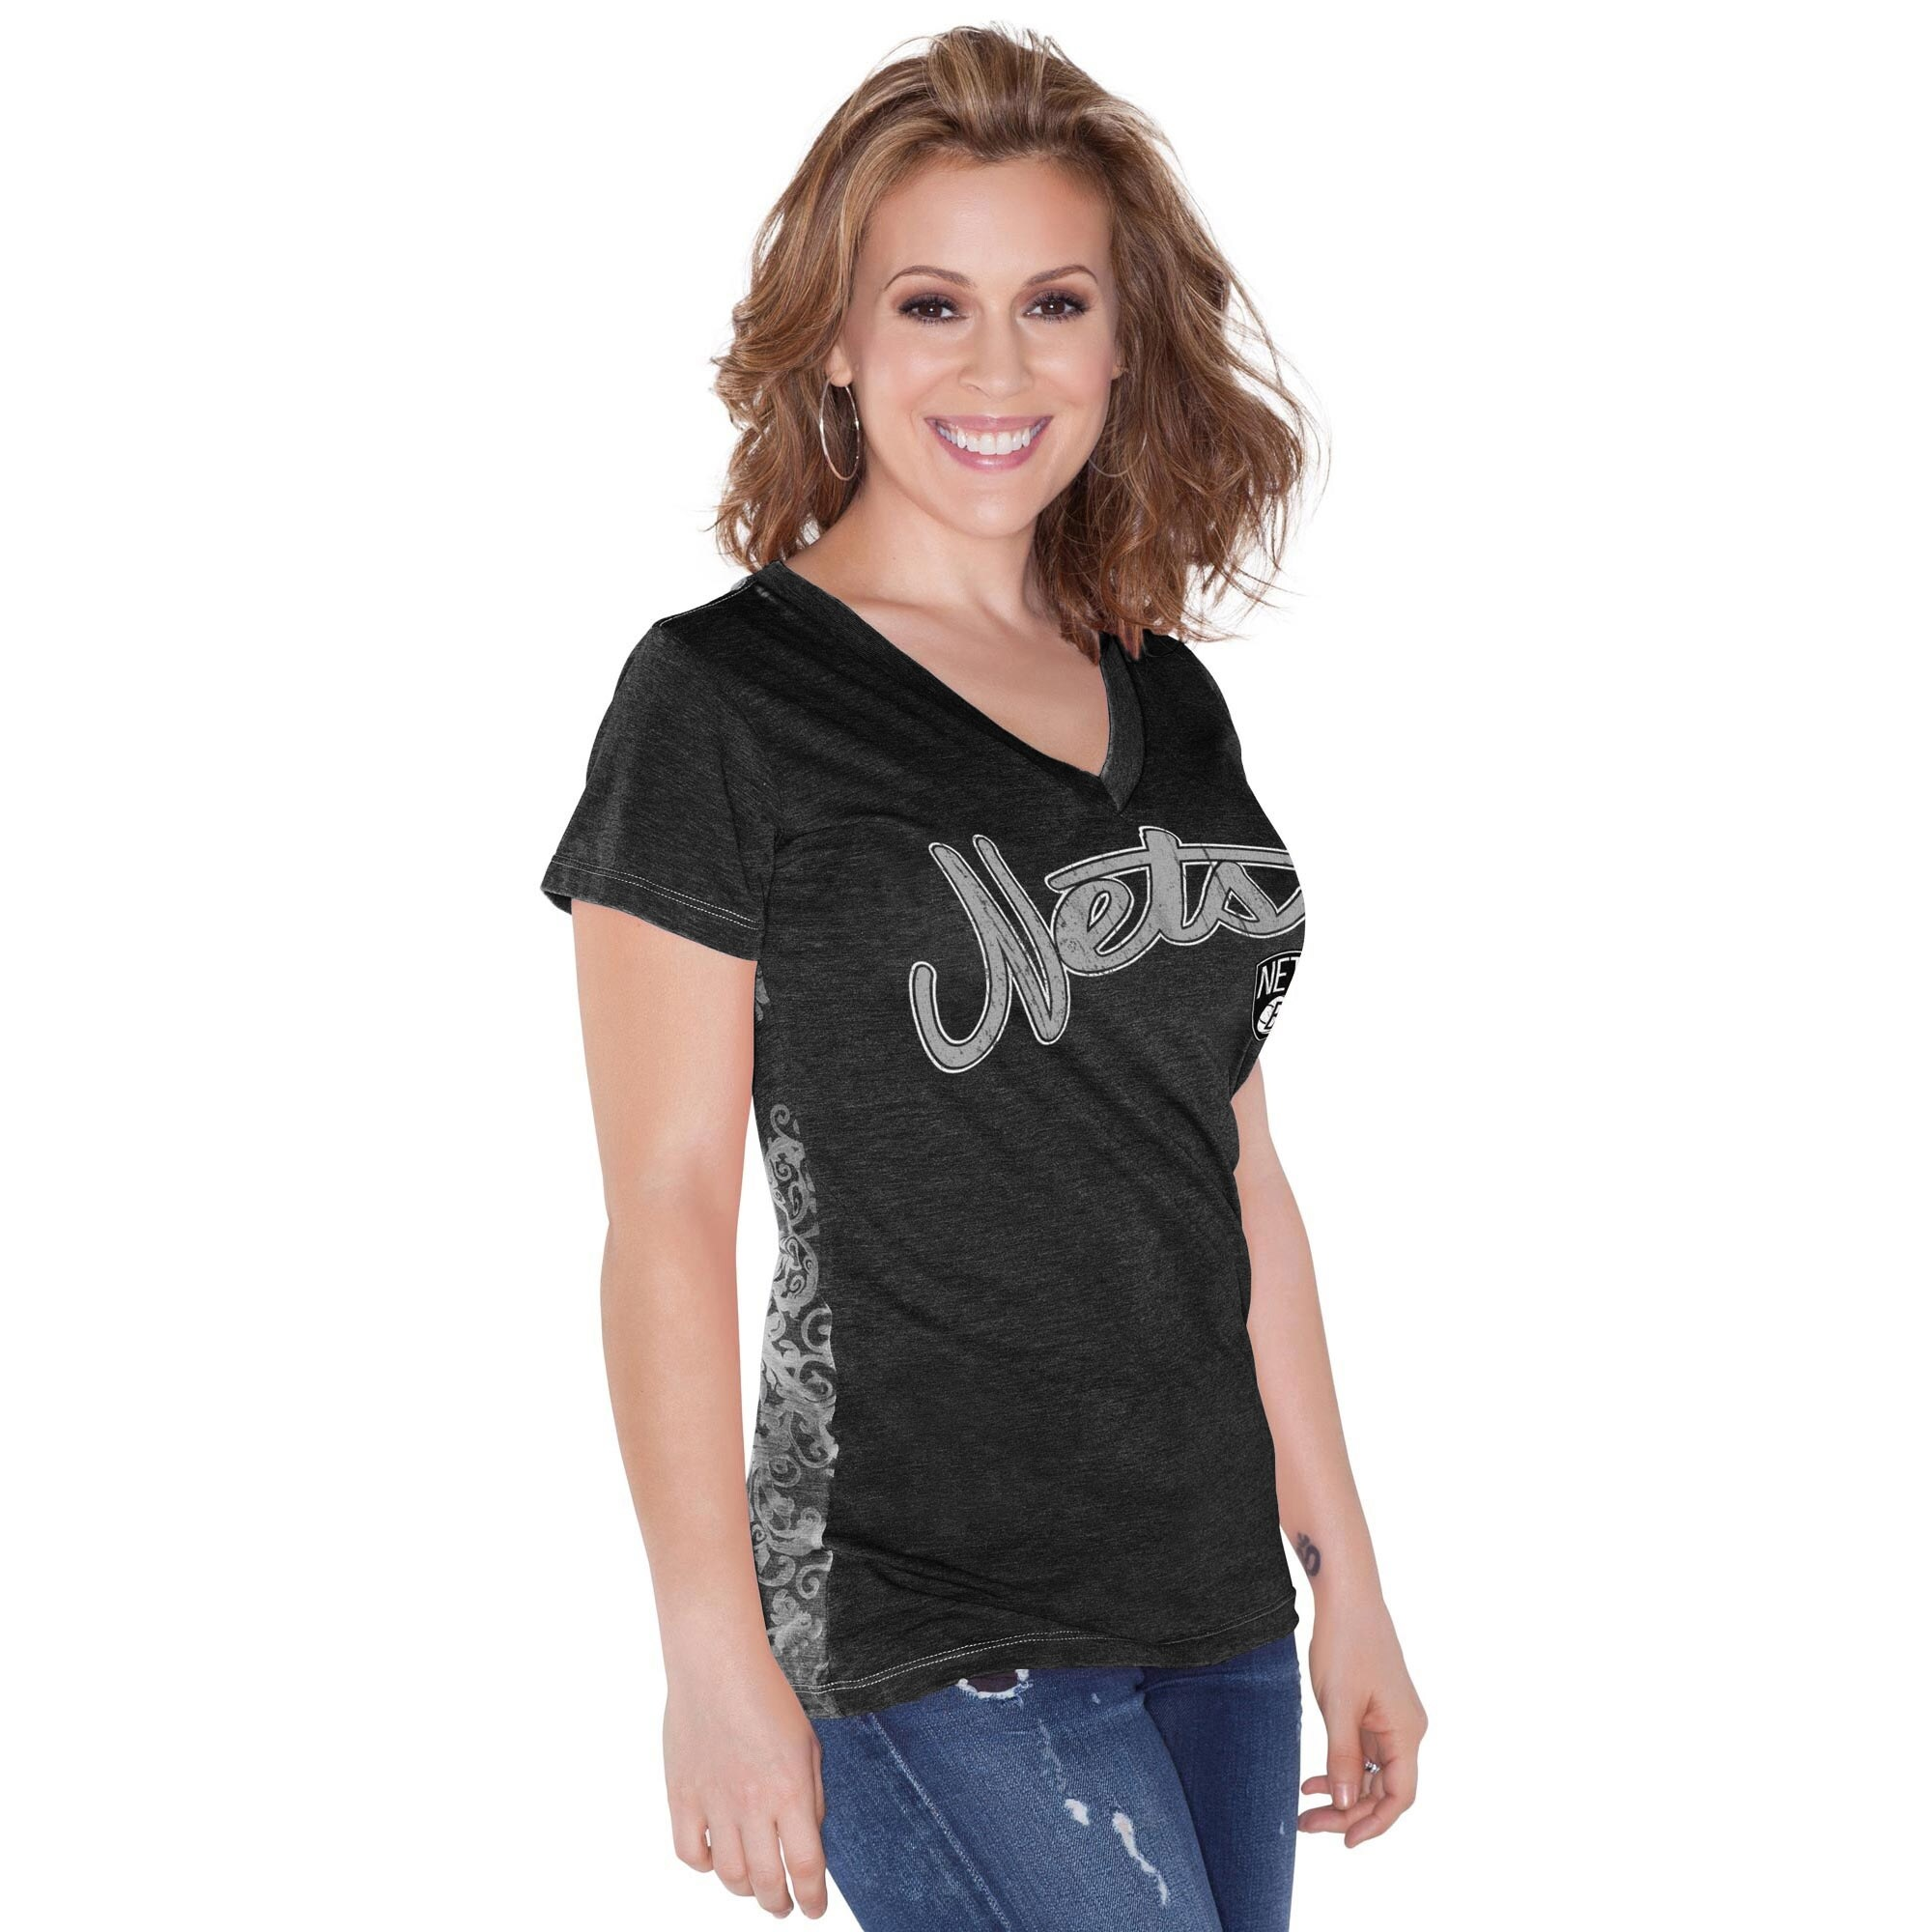 Brooklyn Nets Touch by Alyssa Milano Women's Audrey V-Neck T-Shirt - Black